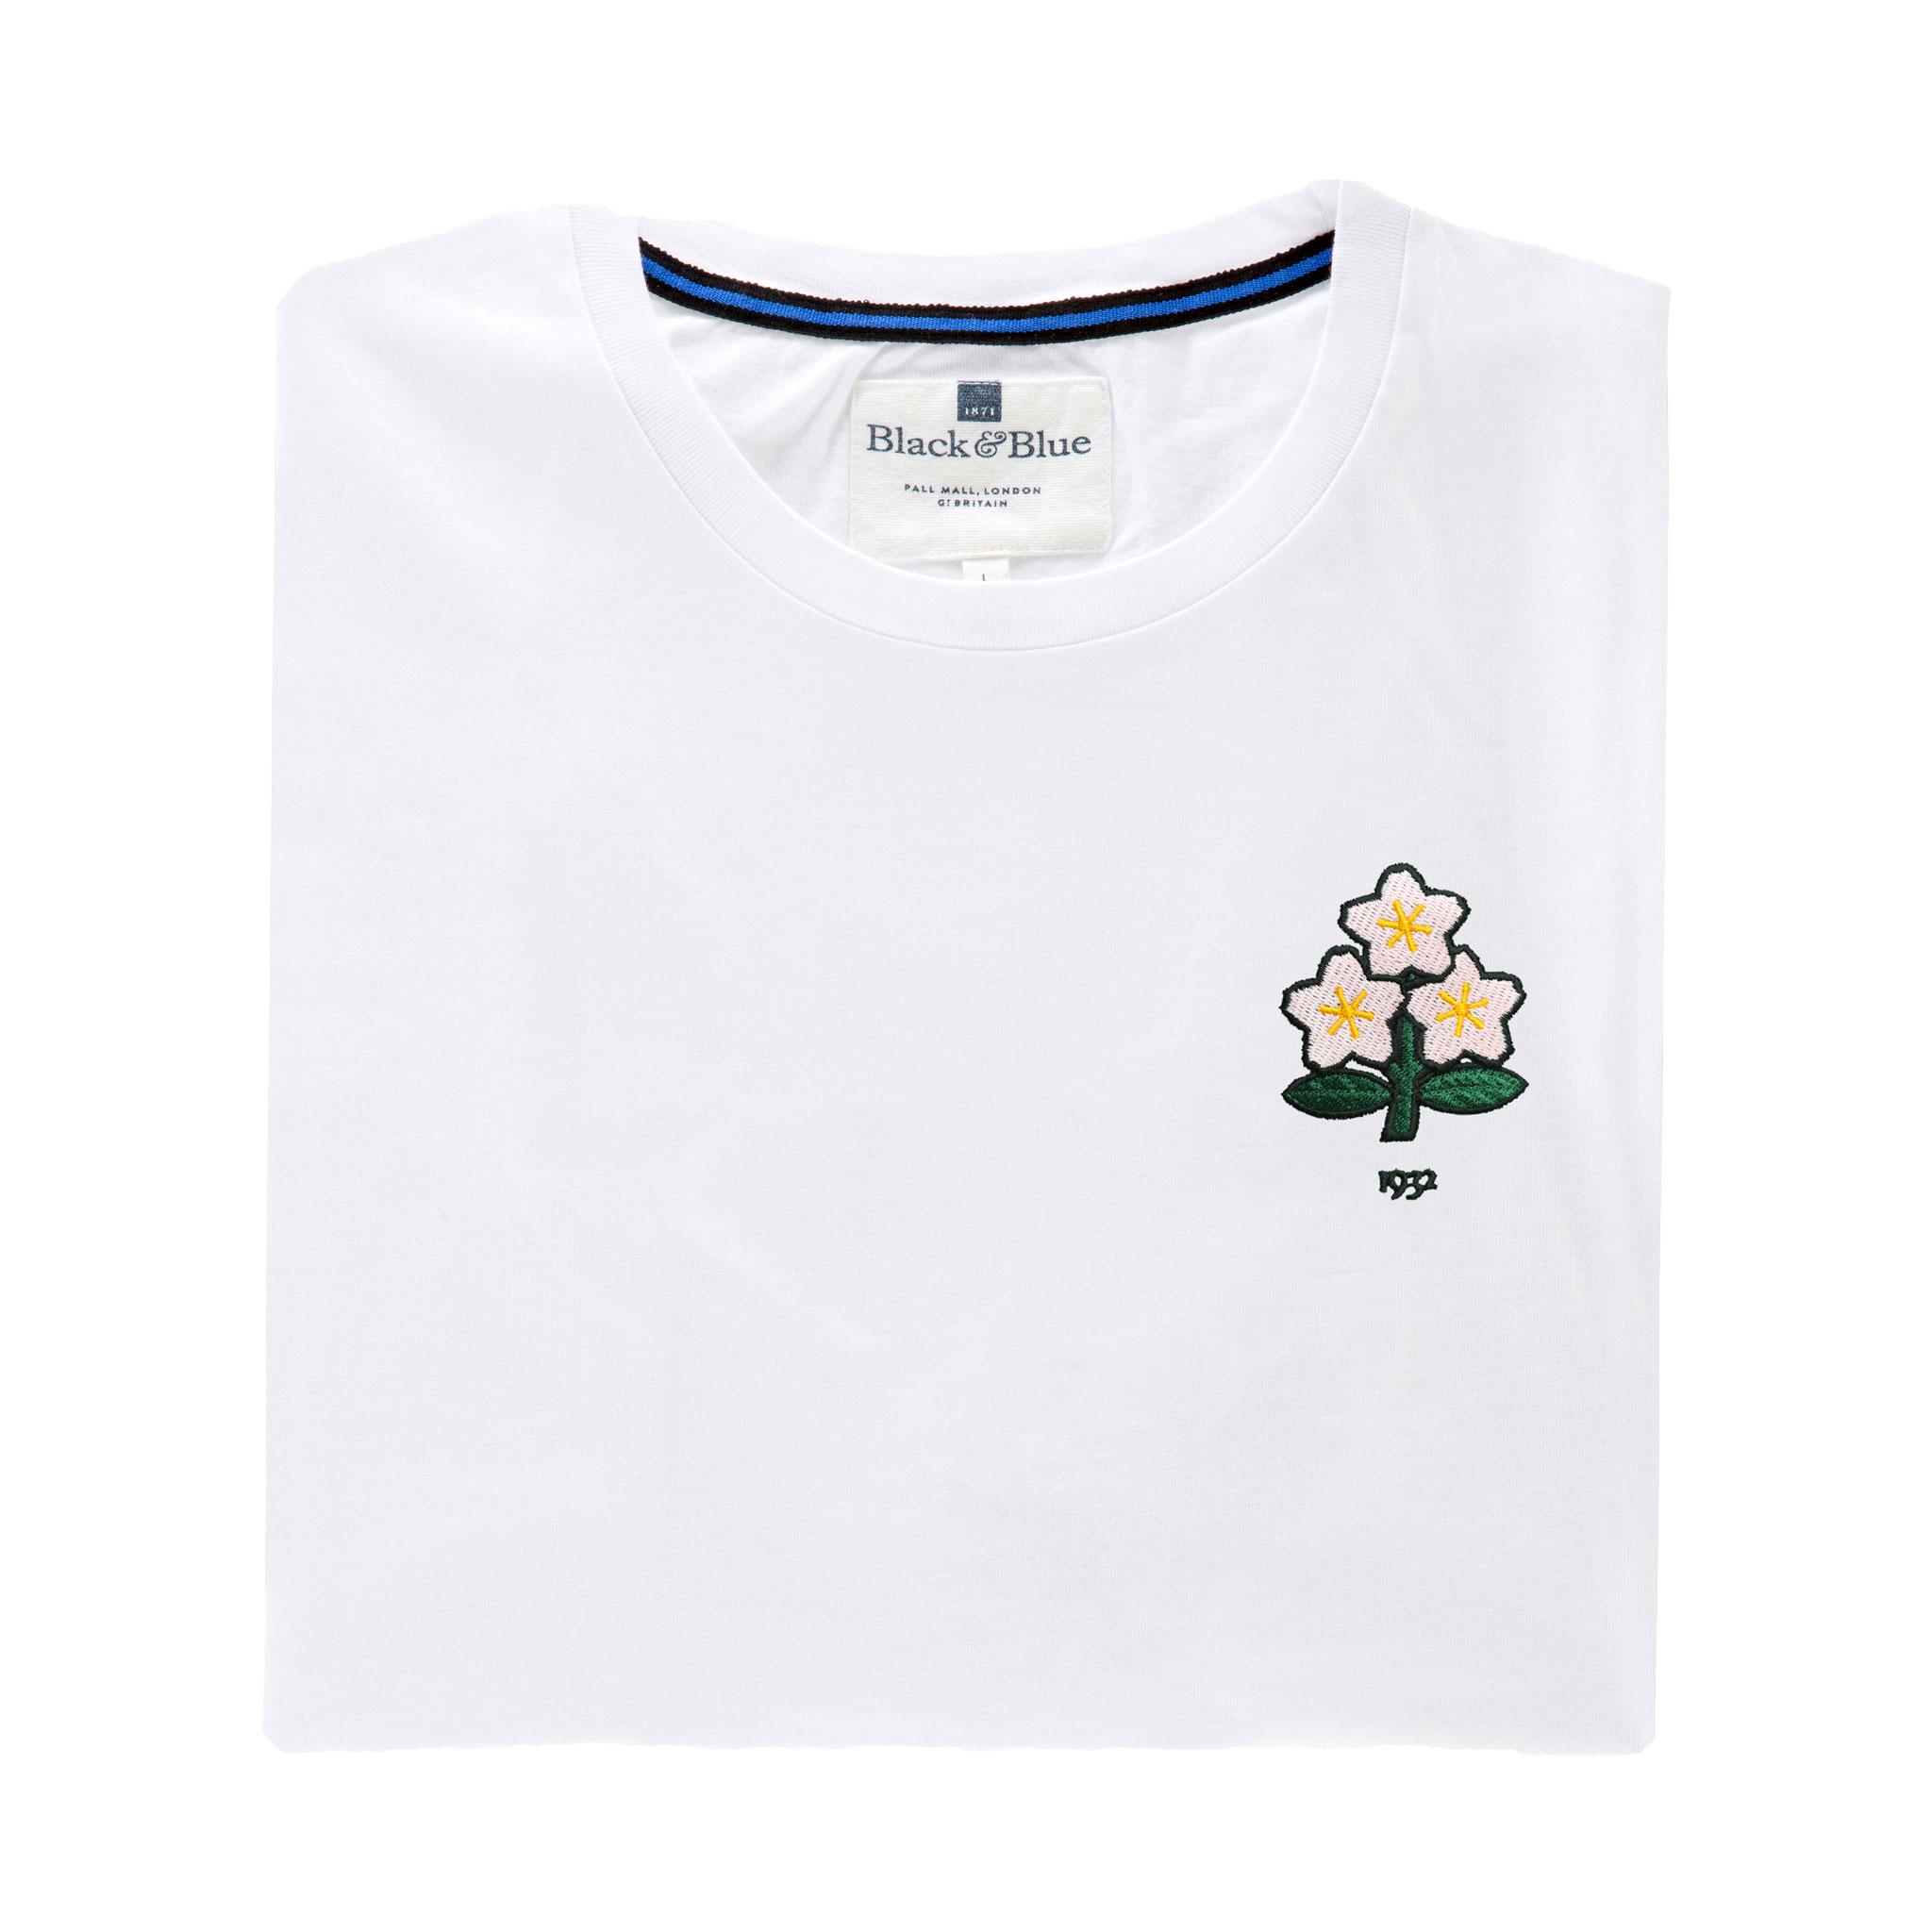 Japan 1932 White Tshirt_Folded